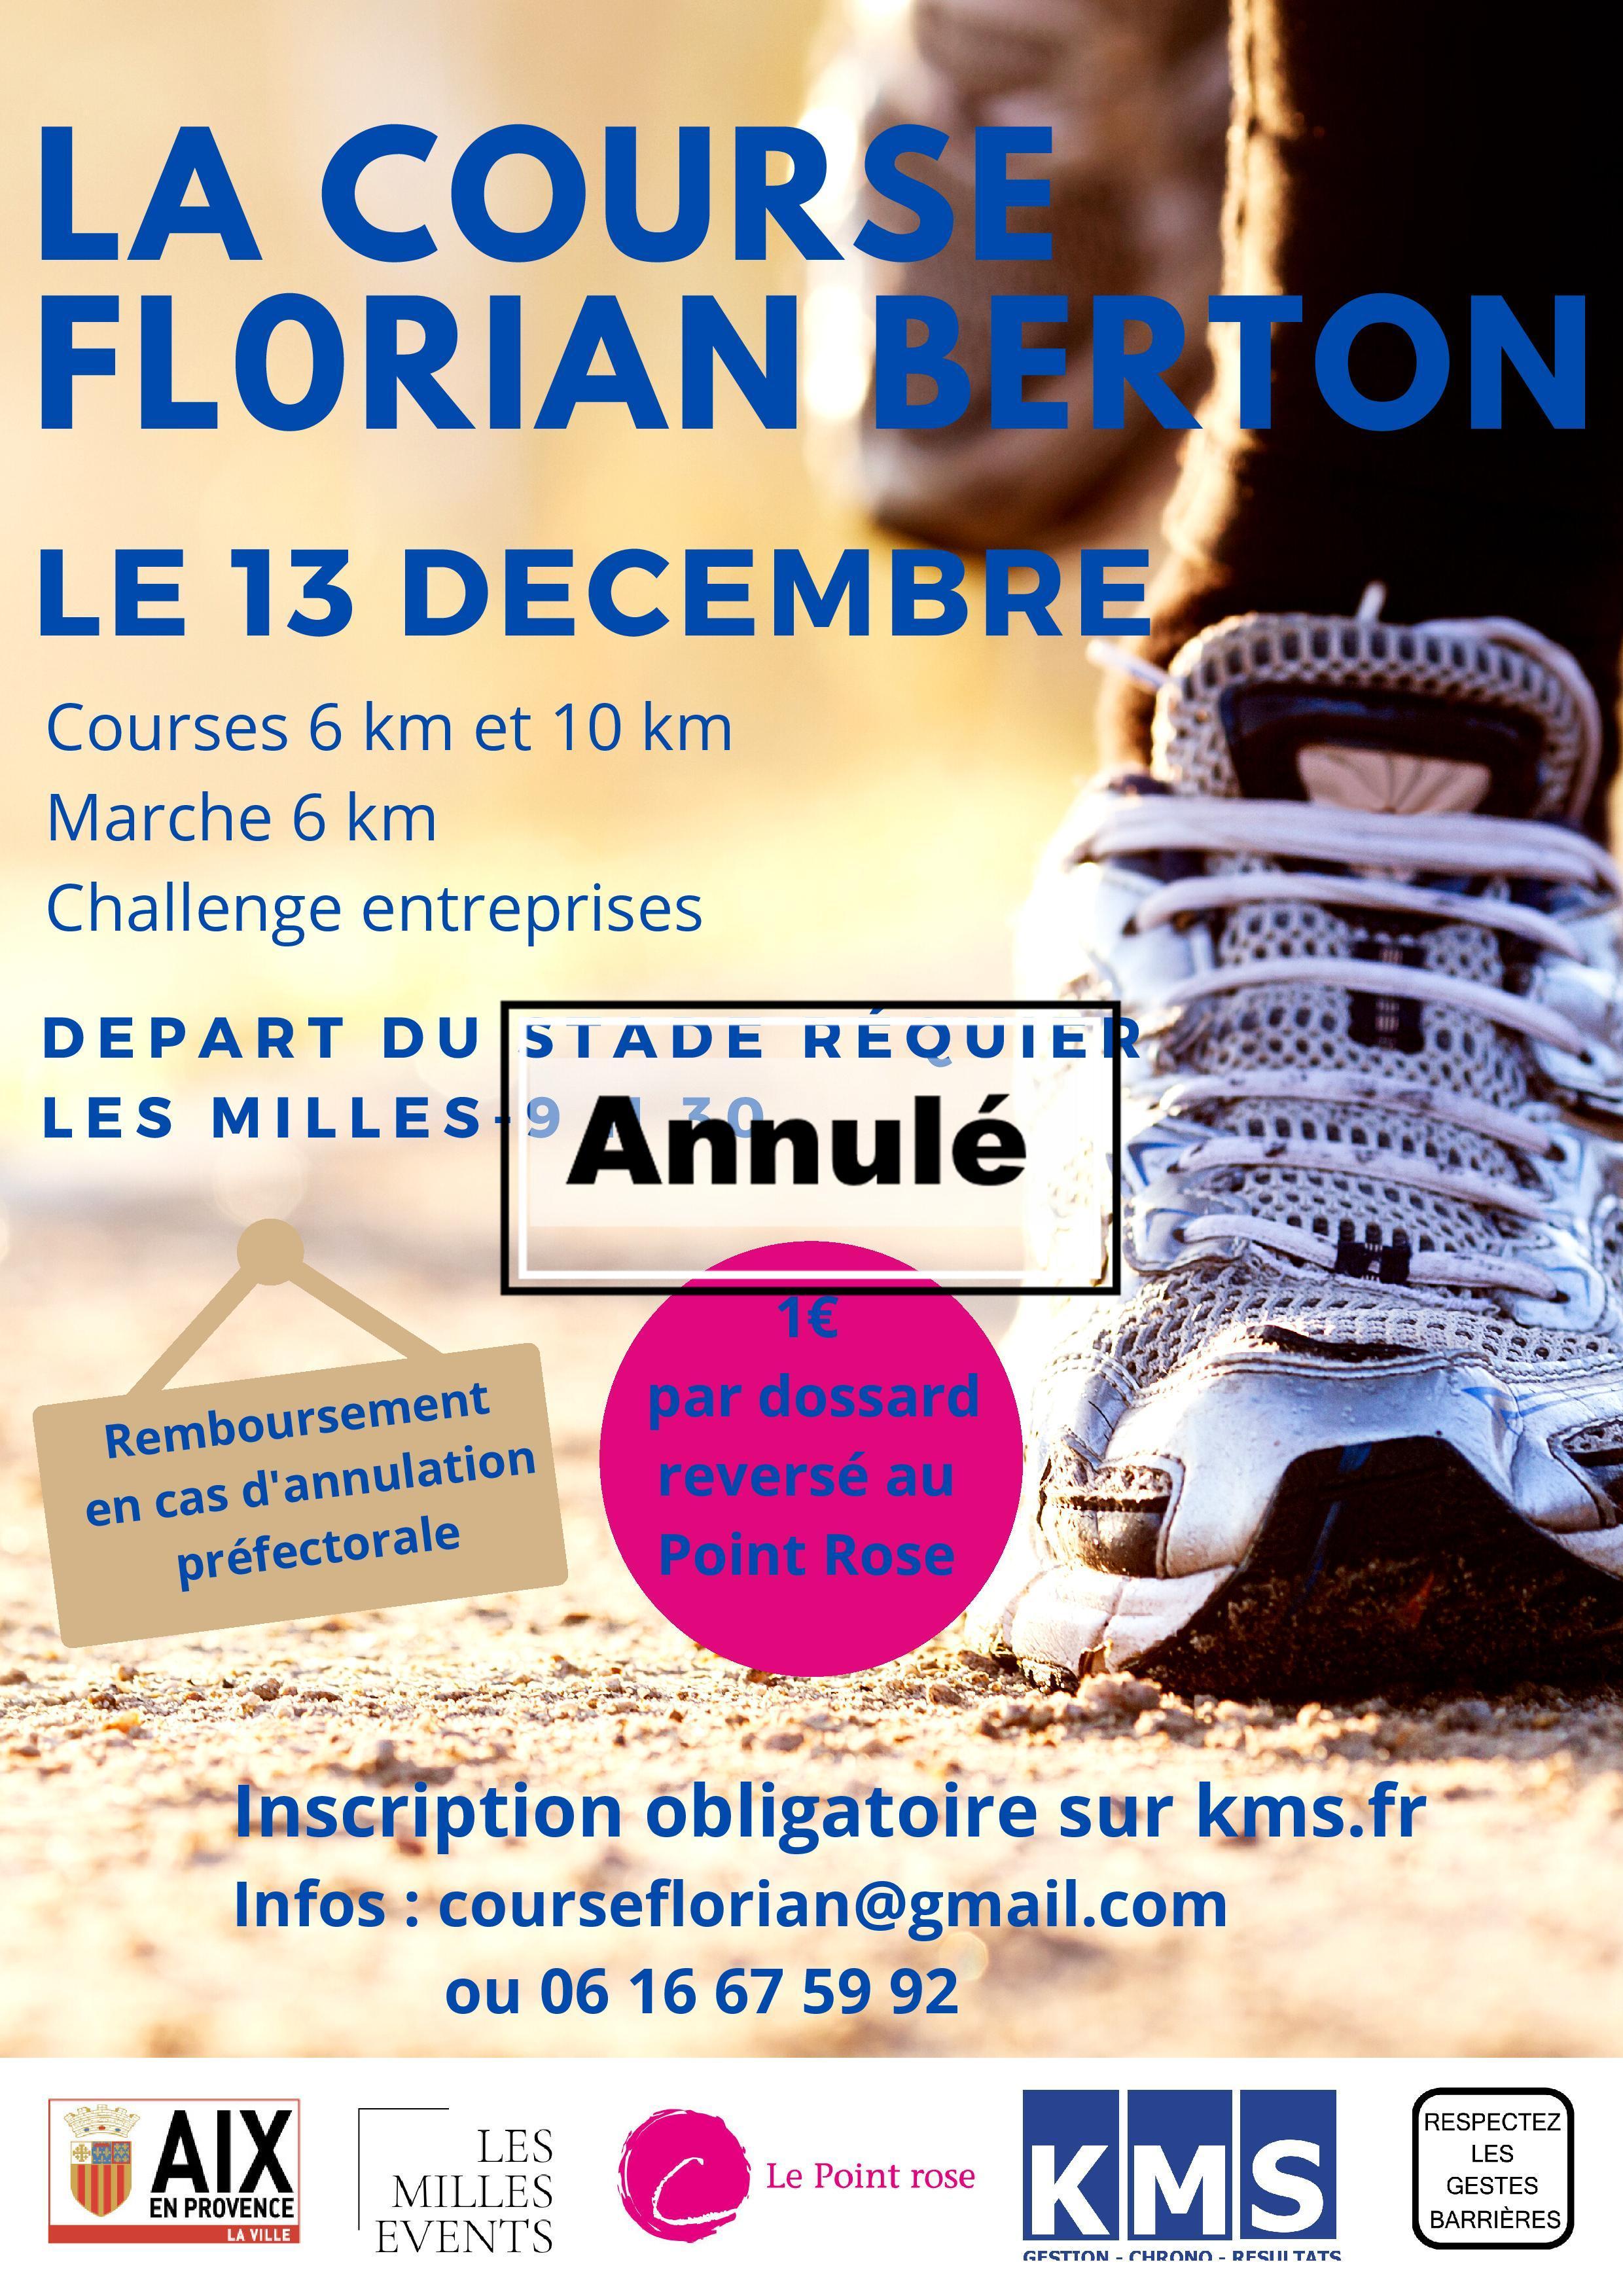 La Course Florian Berton